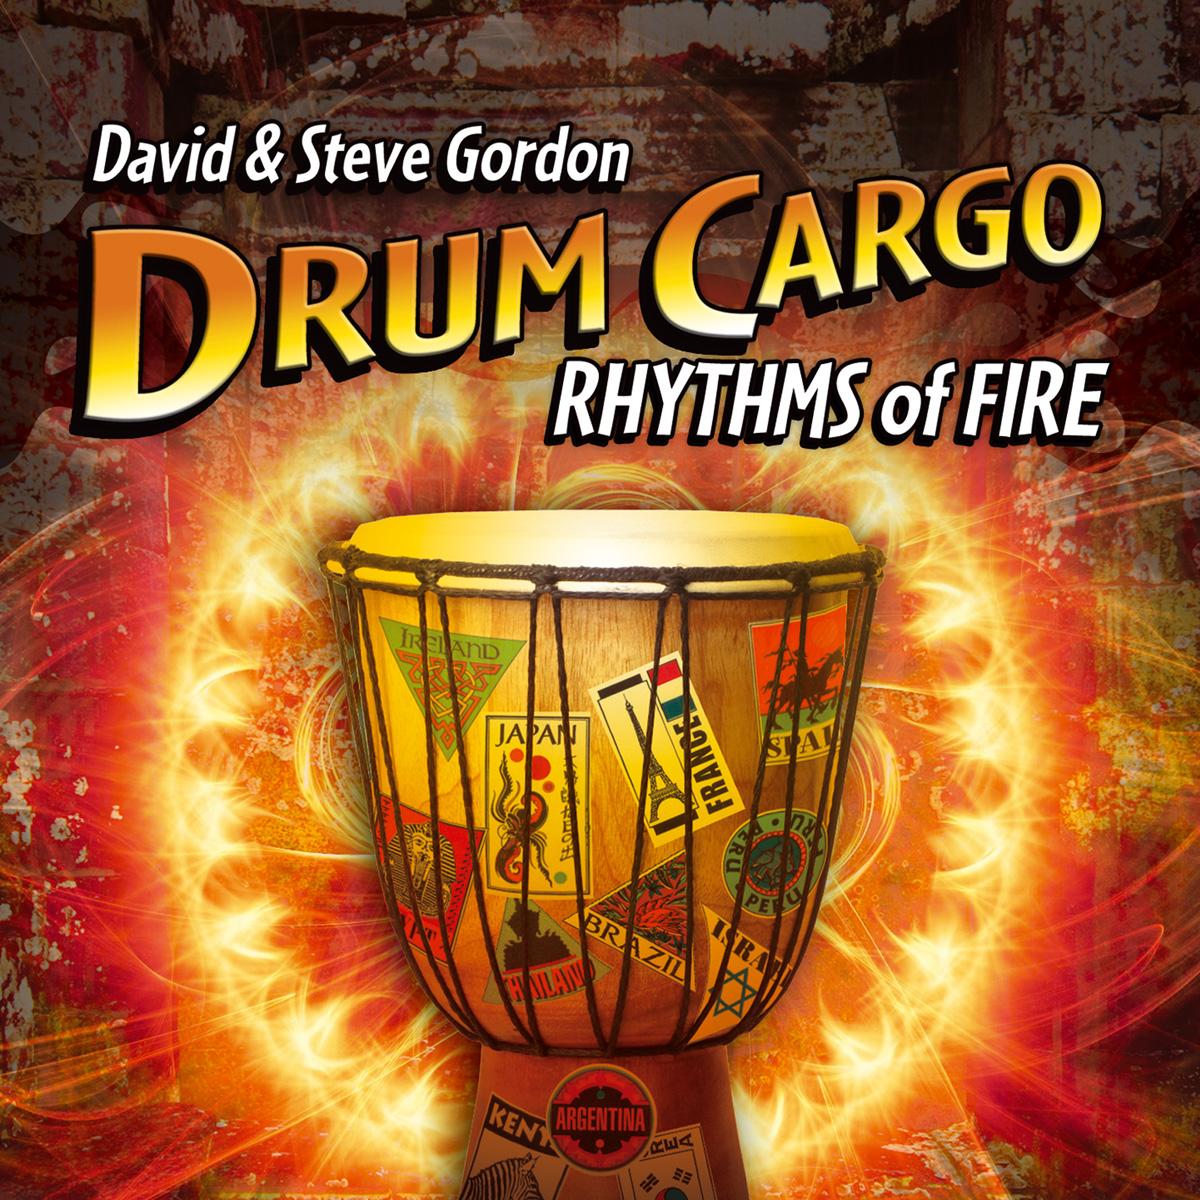 DAVID GORDON & STEVE GORDON - Drum Cargo - Rhythms Of Fire - CD